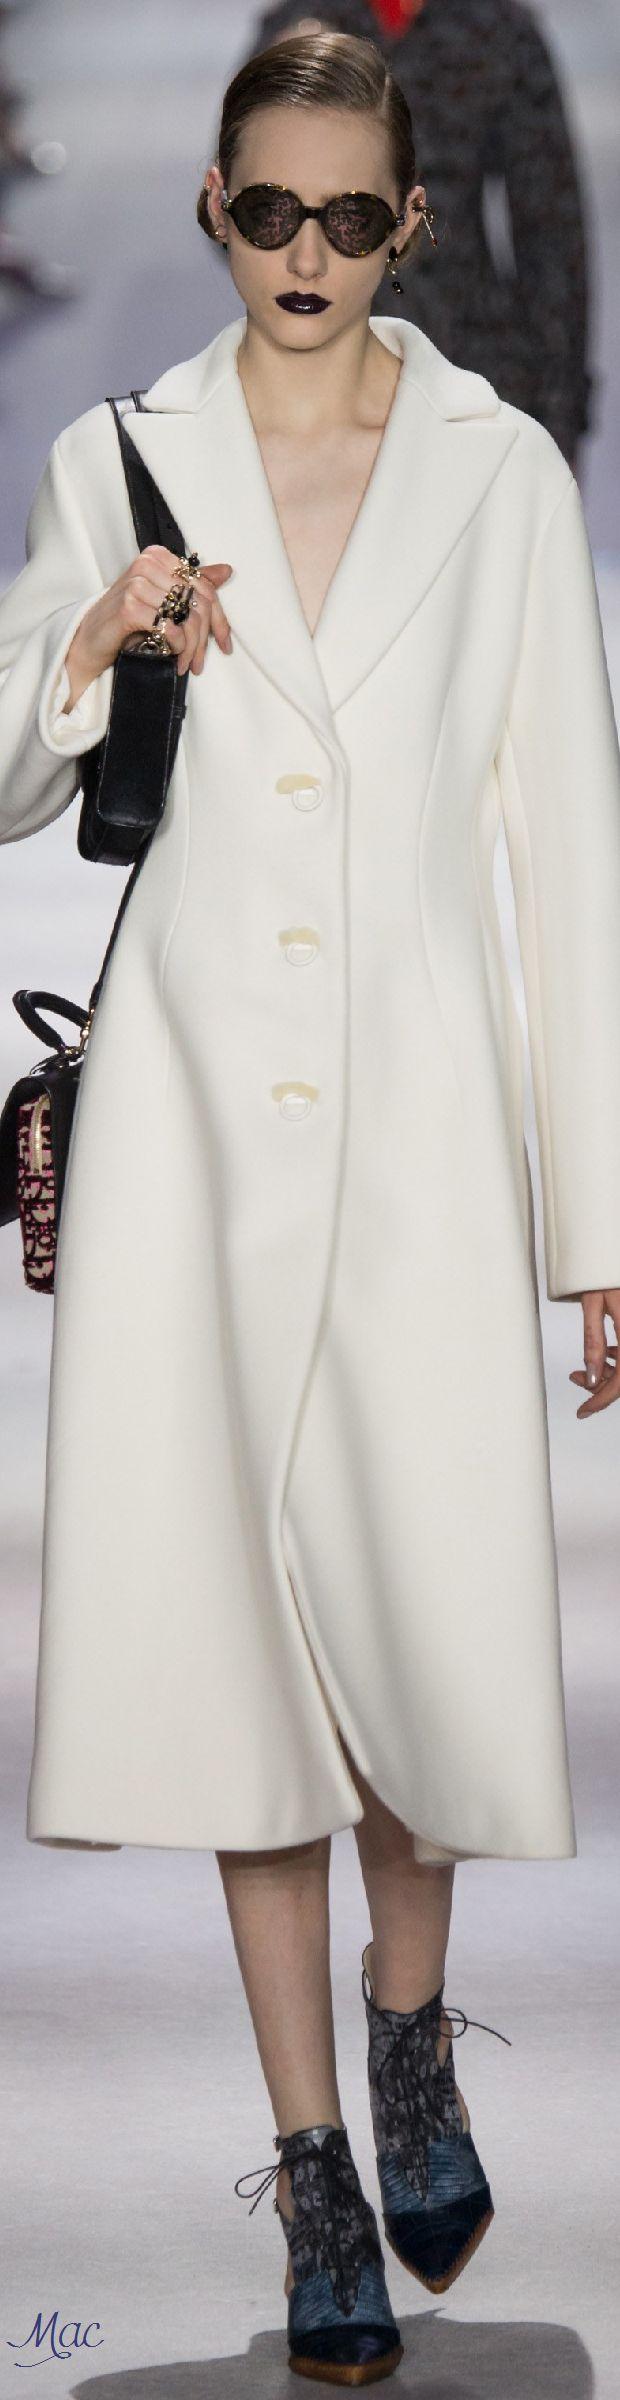 Fall 2016 Ready-to-Wear Christian Dior